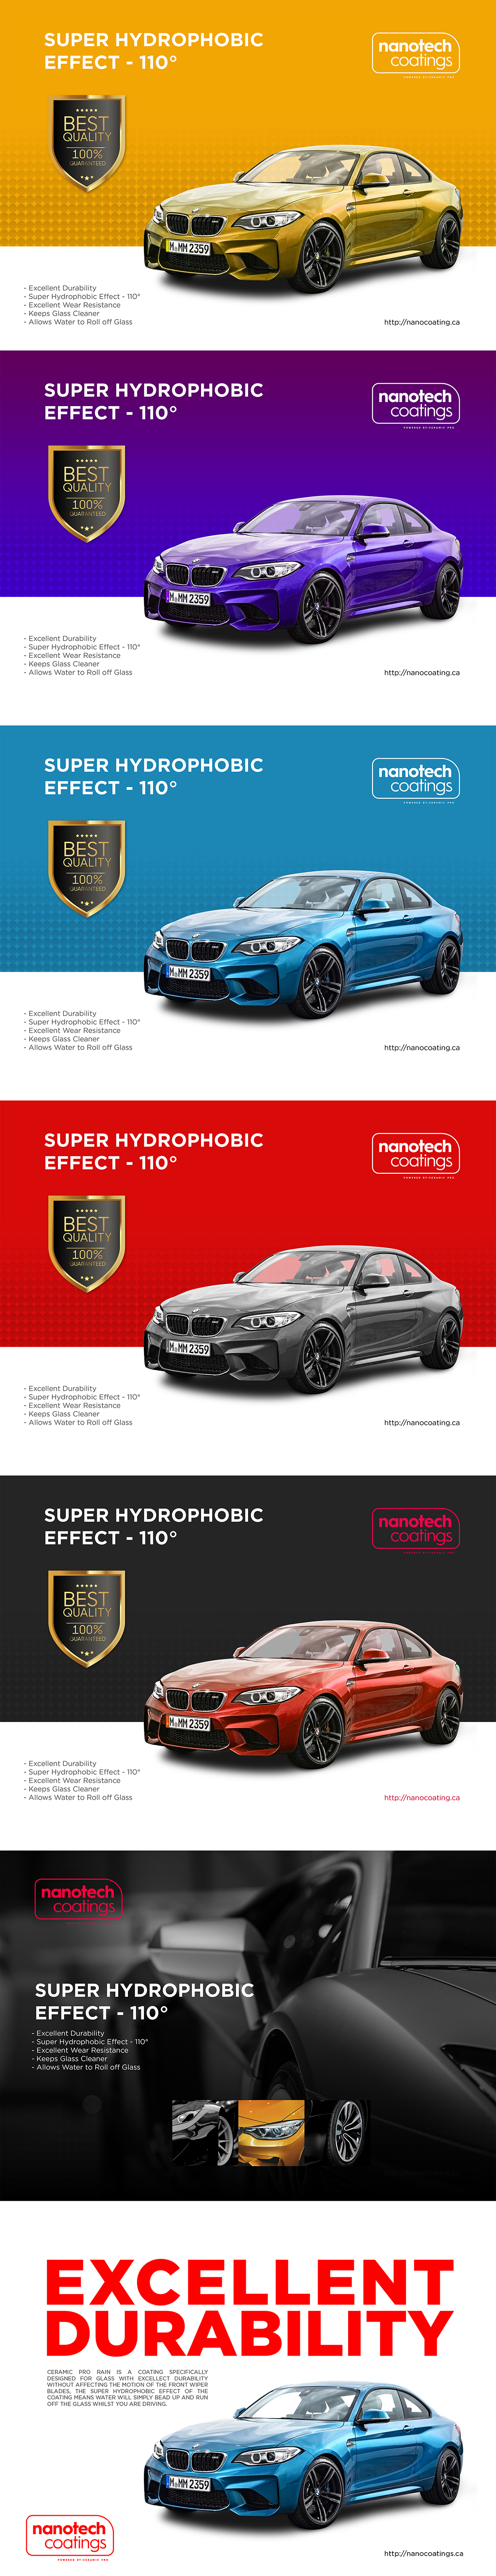 nano,Technology,car,Super Car,saeed elgar,Canada,posters,ads,Advertising ,design,black